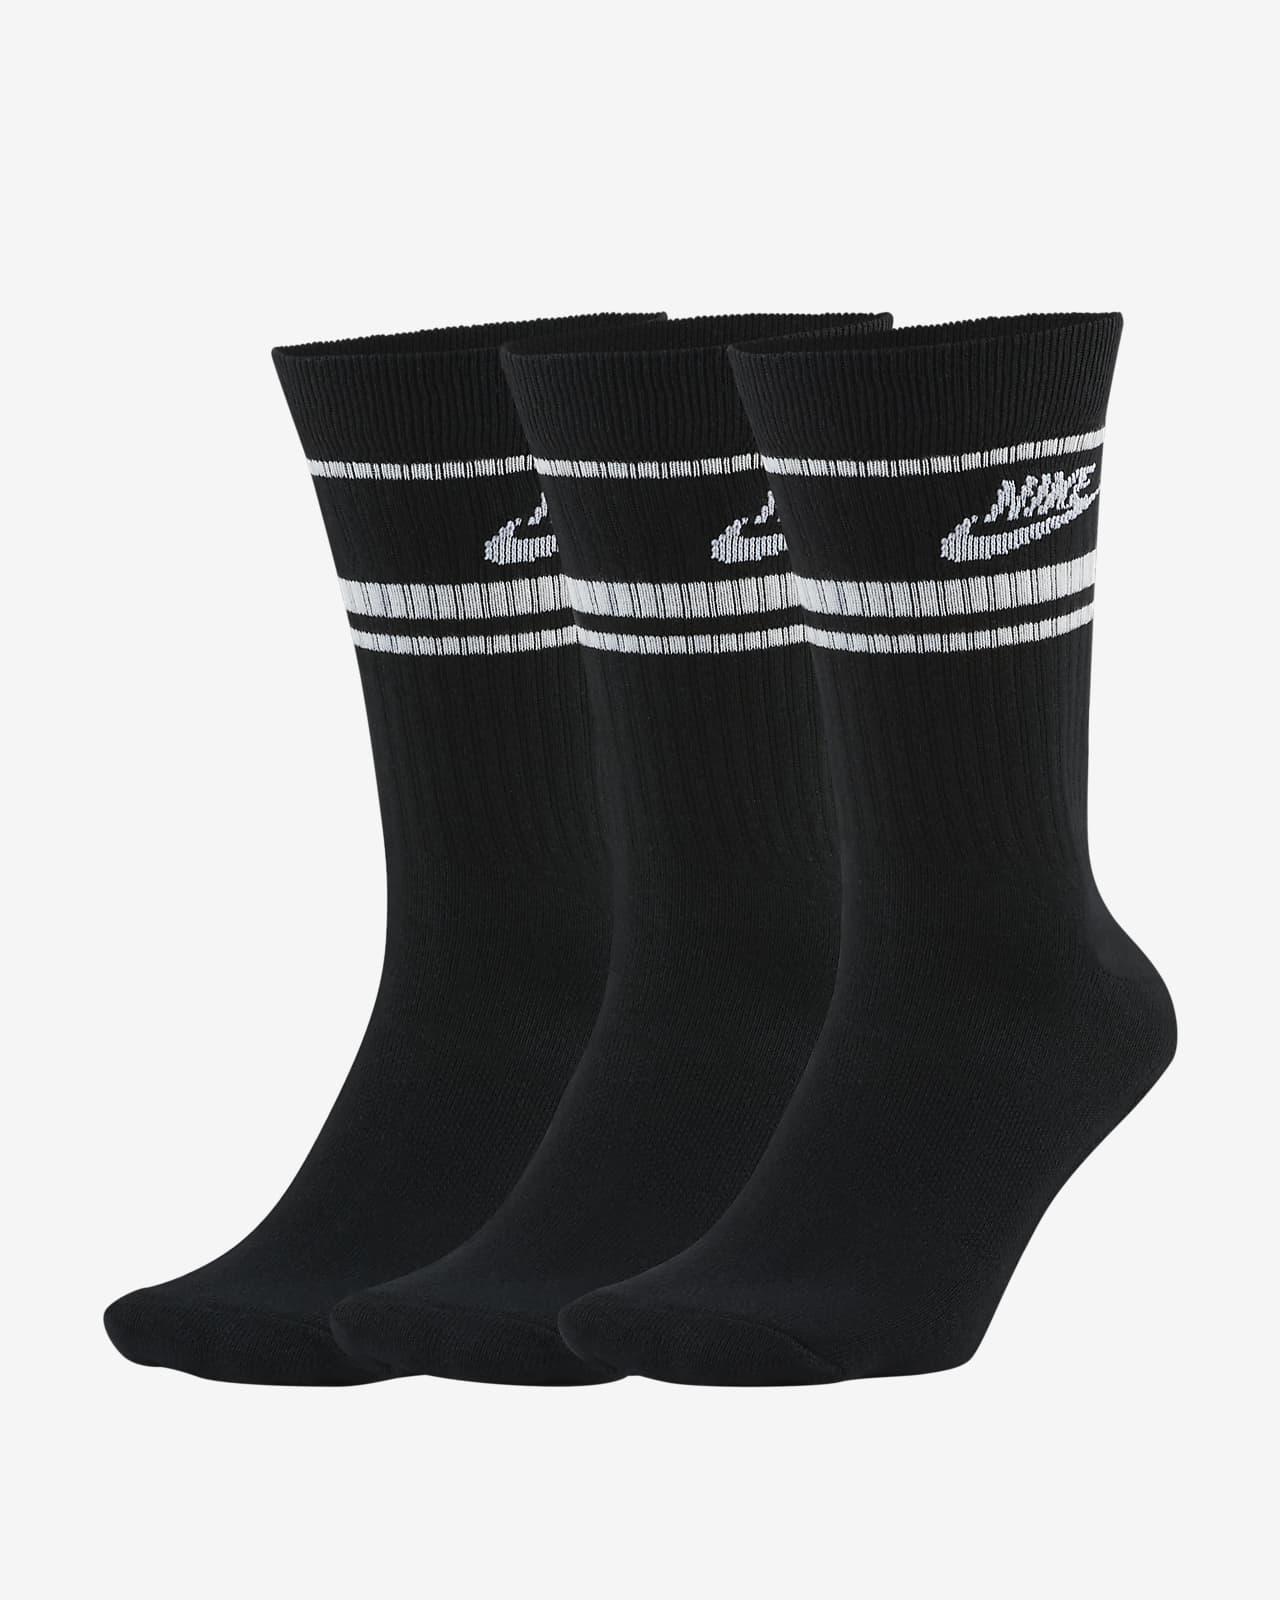 Nike Sportswear Essential Calcetines largos (3 pares)